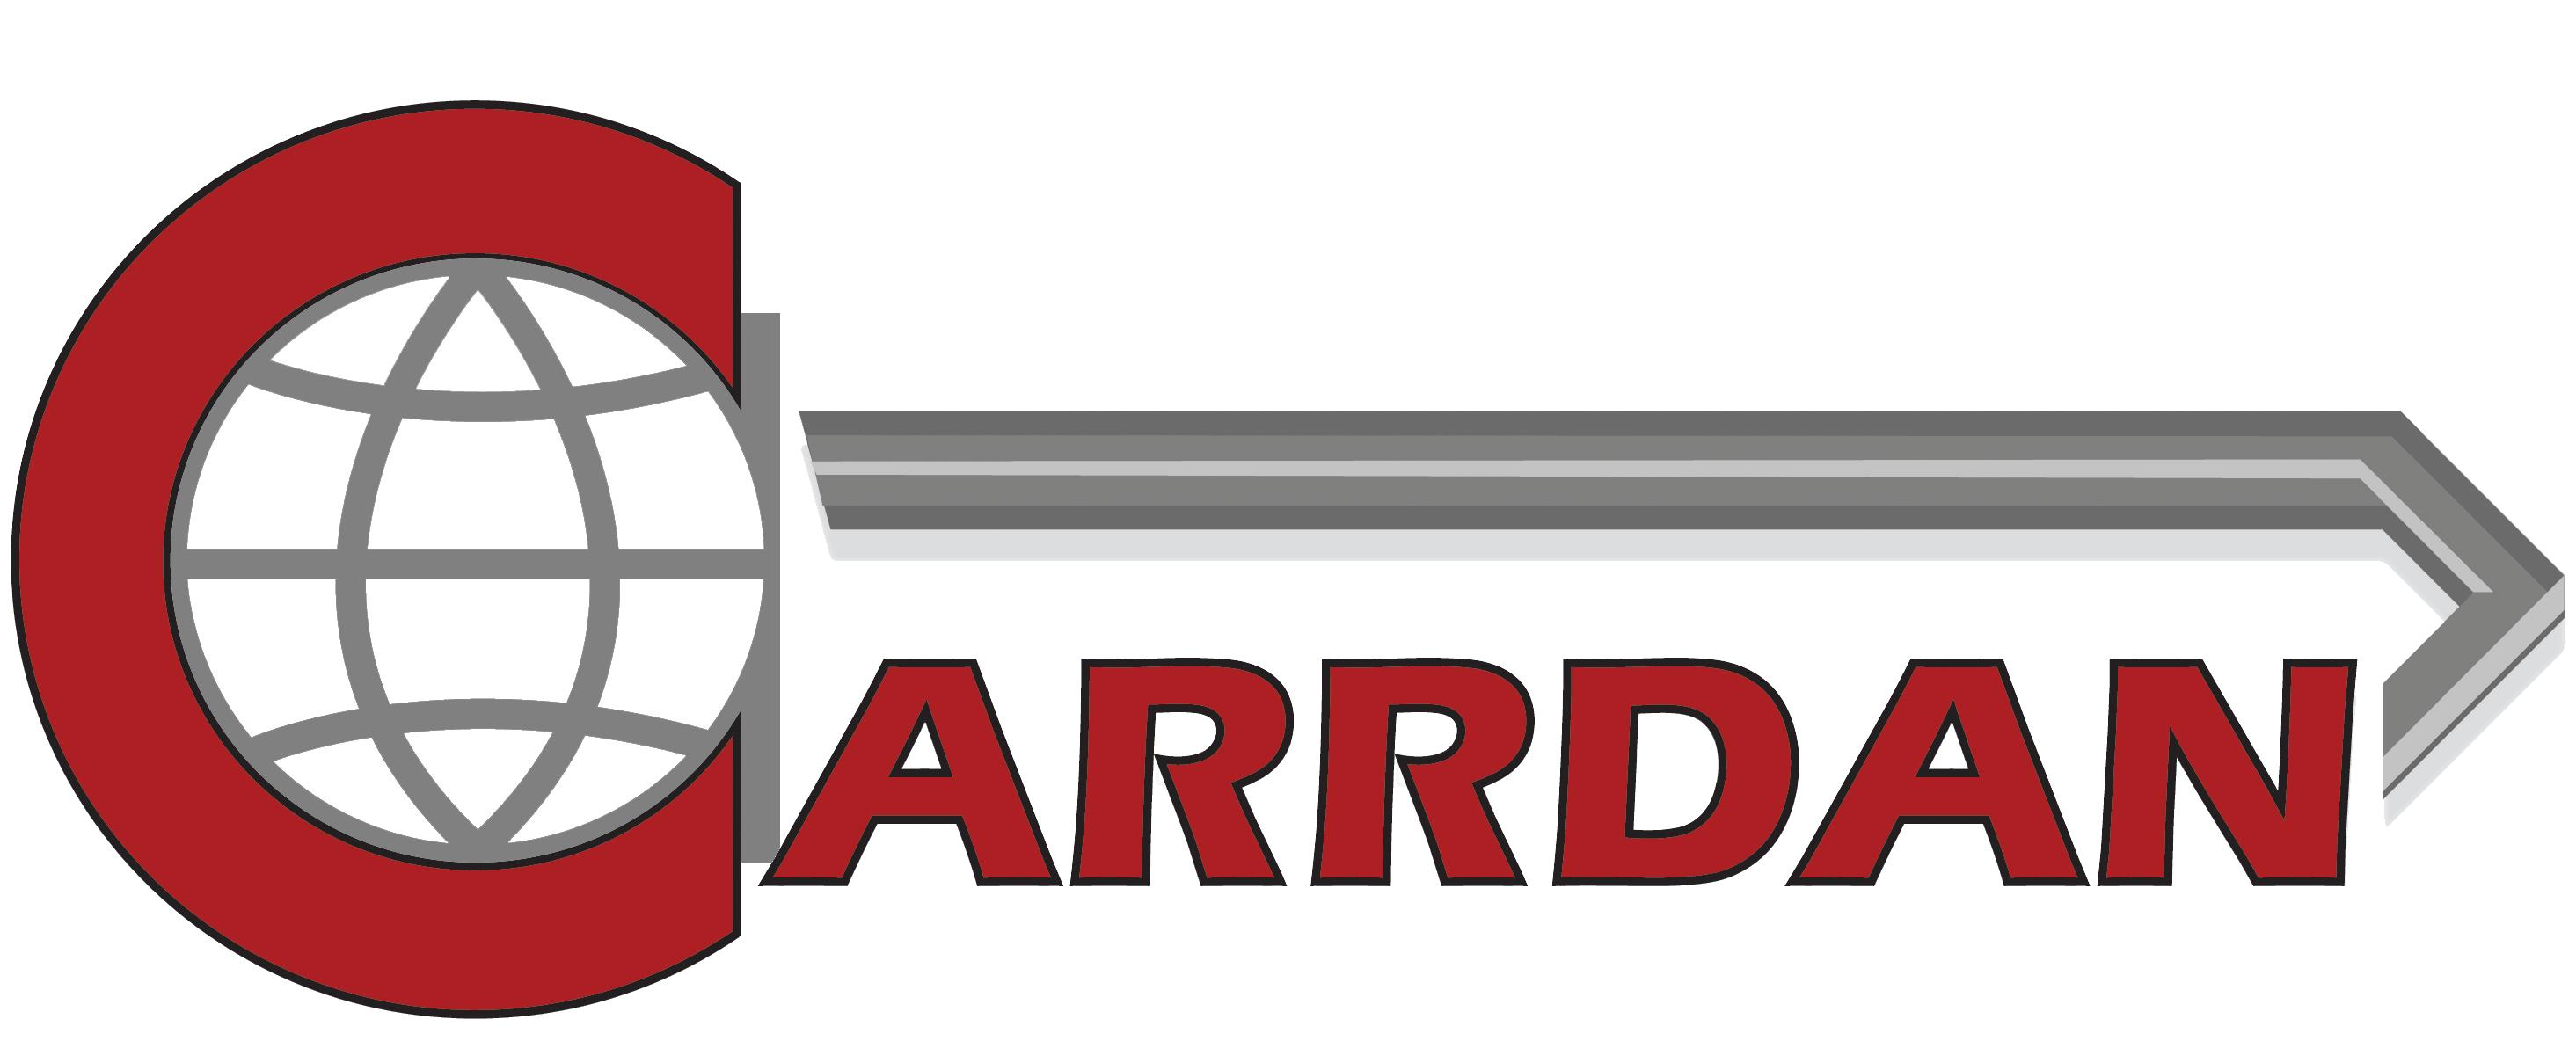 2016CarrdanLogoTrans_new